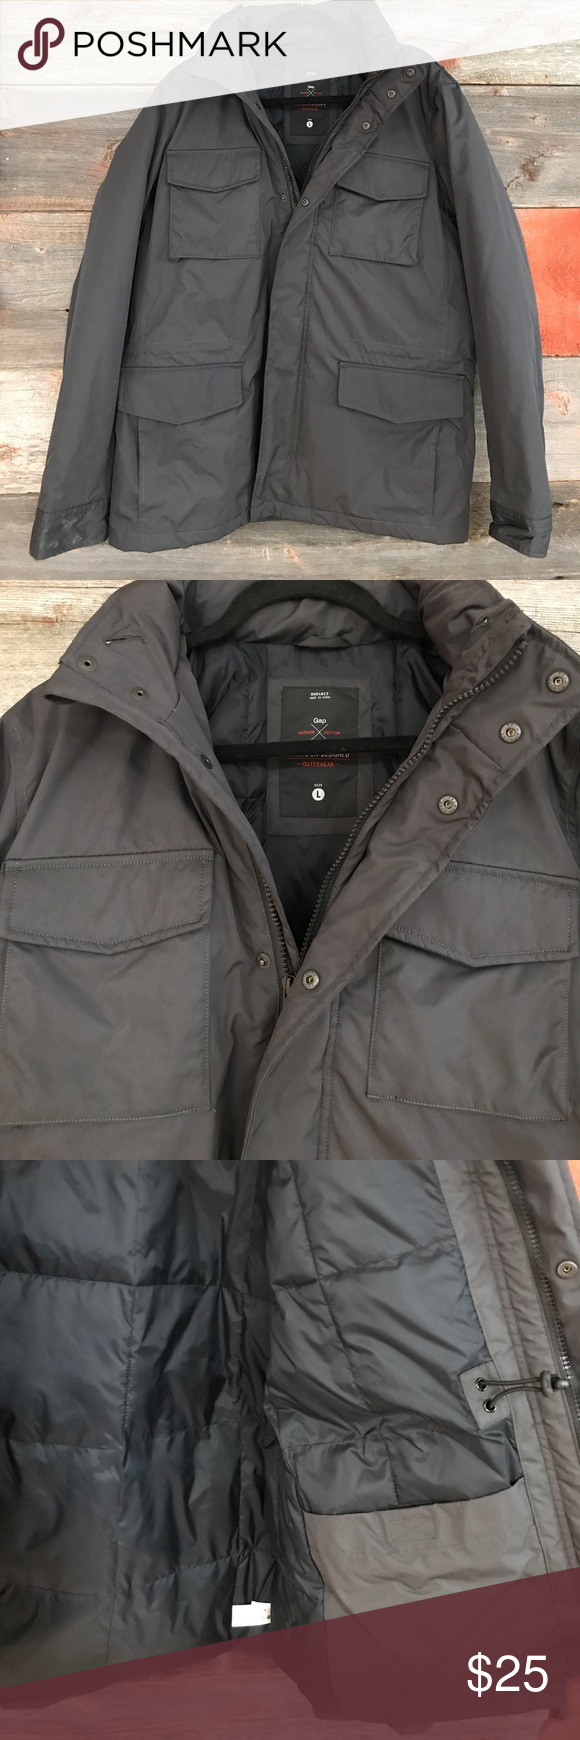 Gap Jacket Gap Jacket Jackets Winter Jackets [ 1740 x 580 Pixel ]